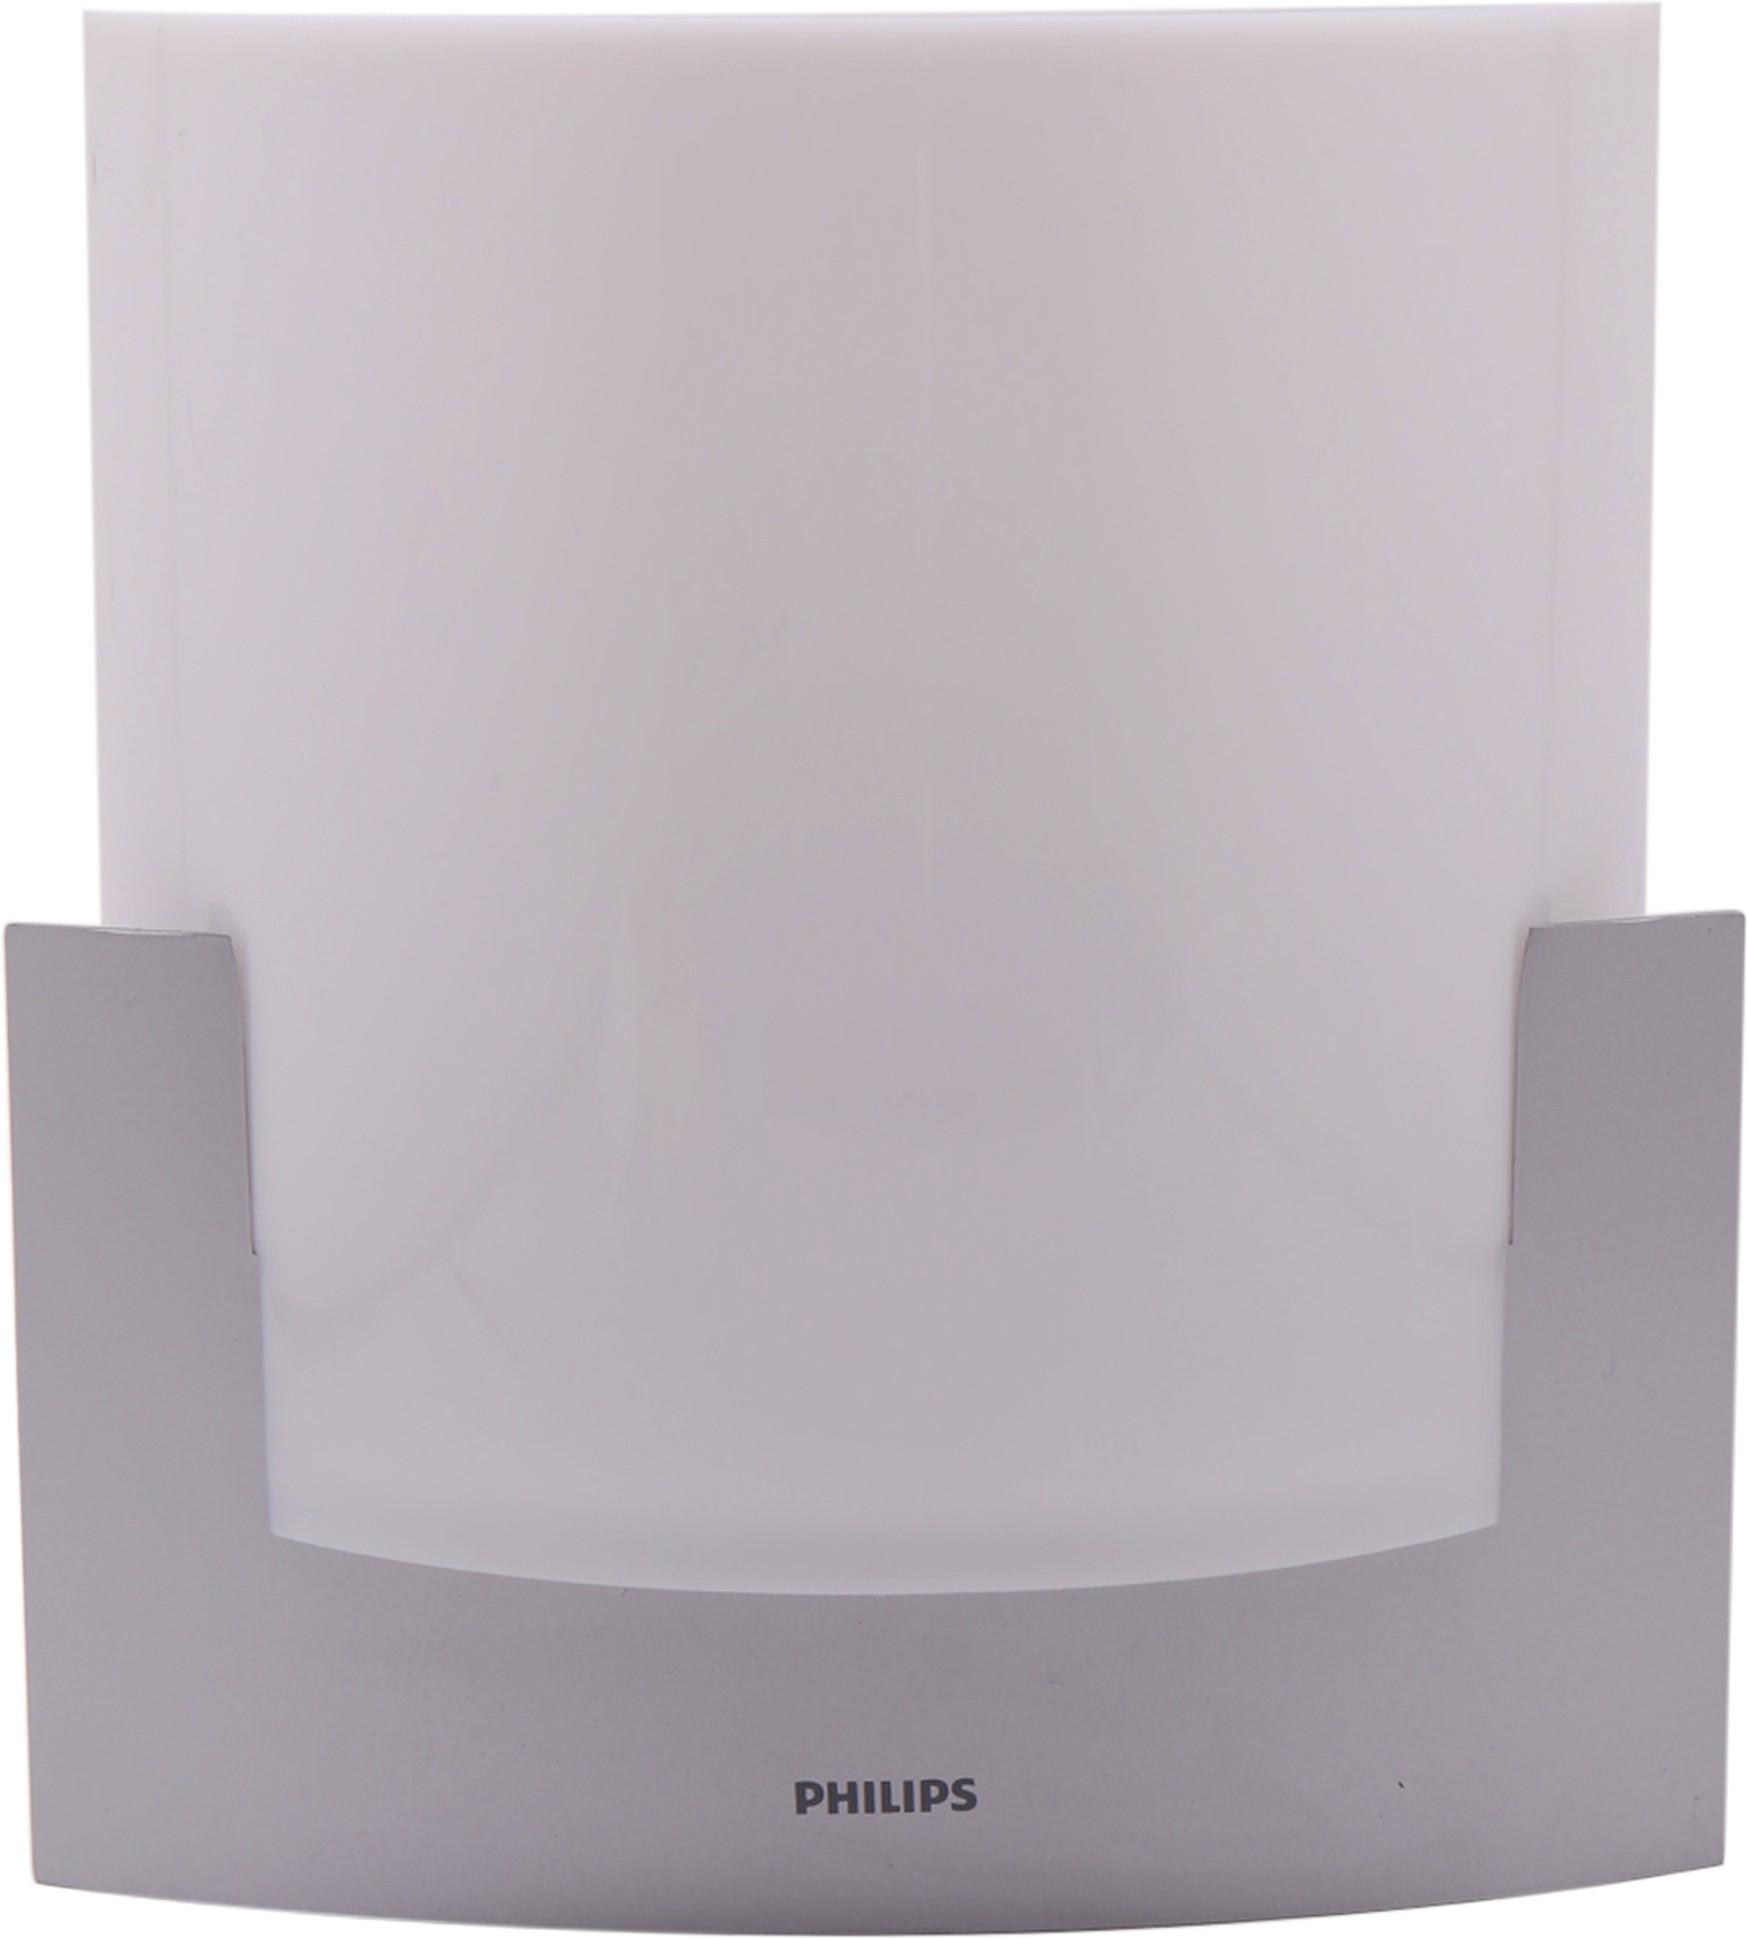 Night lamps india - Philips Omega Night Lamp